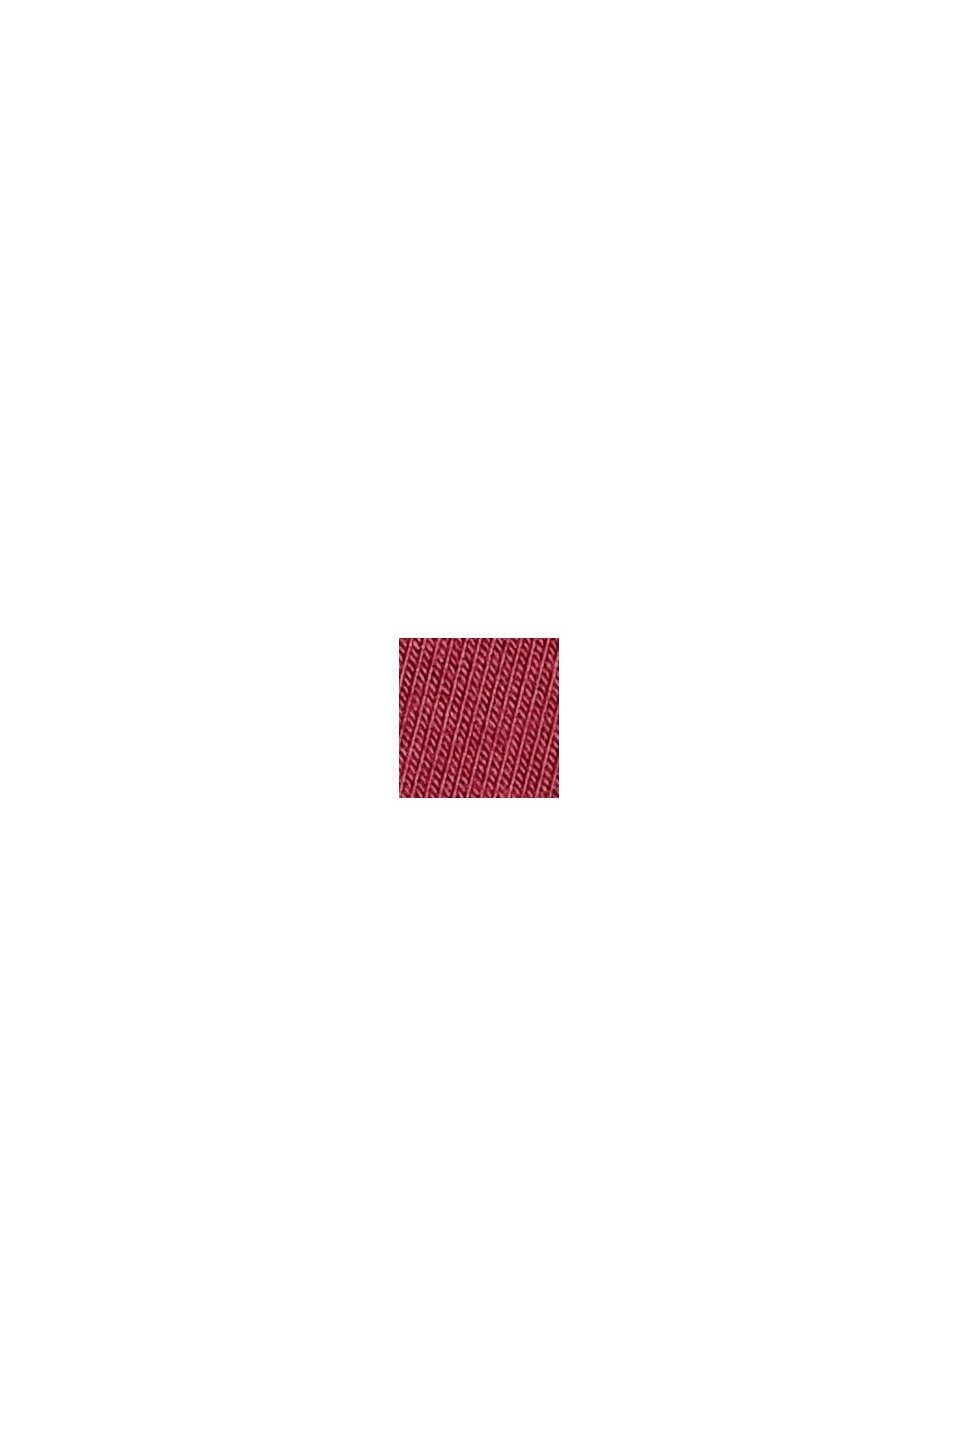 Jersey nachthemd van LENZING™ ECOVERO™, DARK RED, swatch